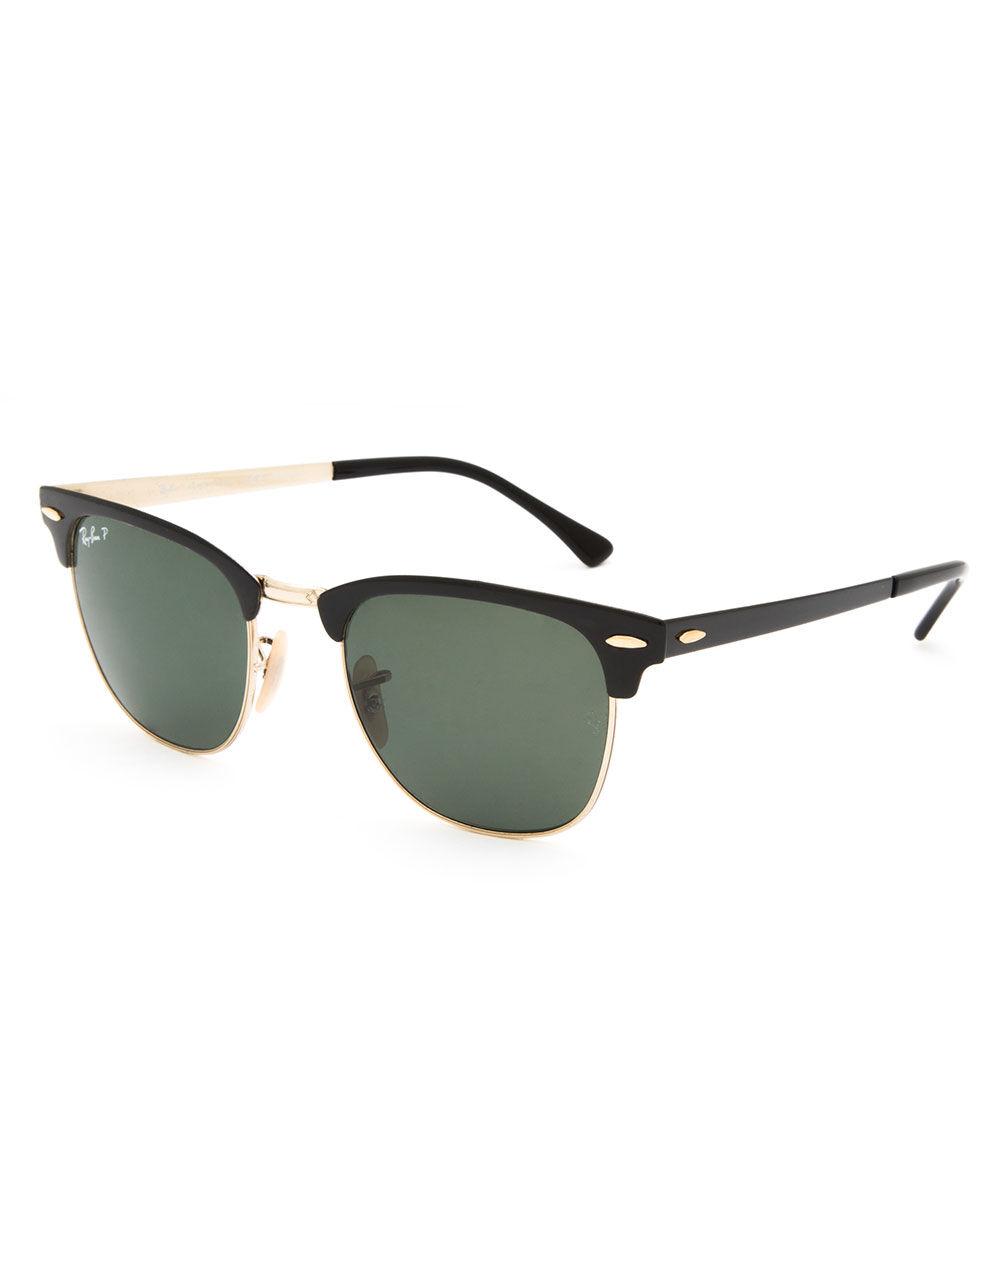 RAY-BAN Clubmaster Metal Black & Green Classic Polarized Sunglasses